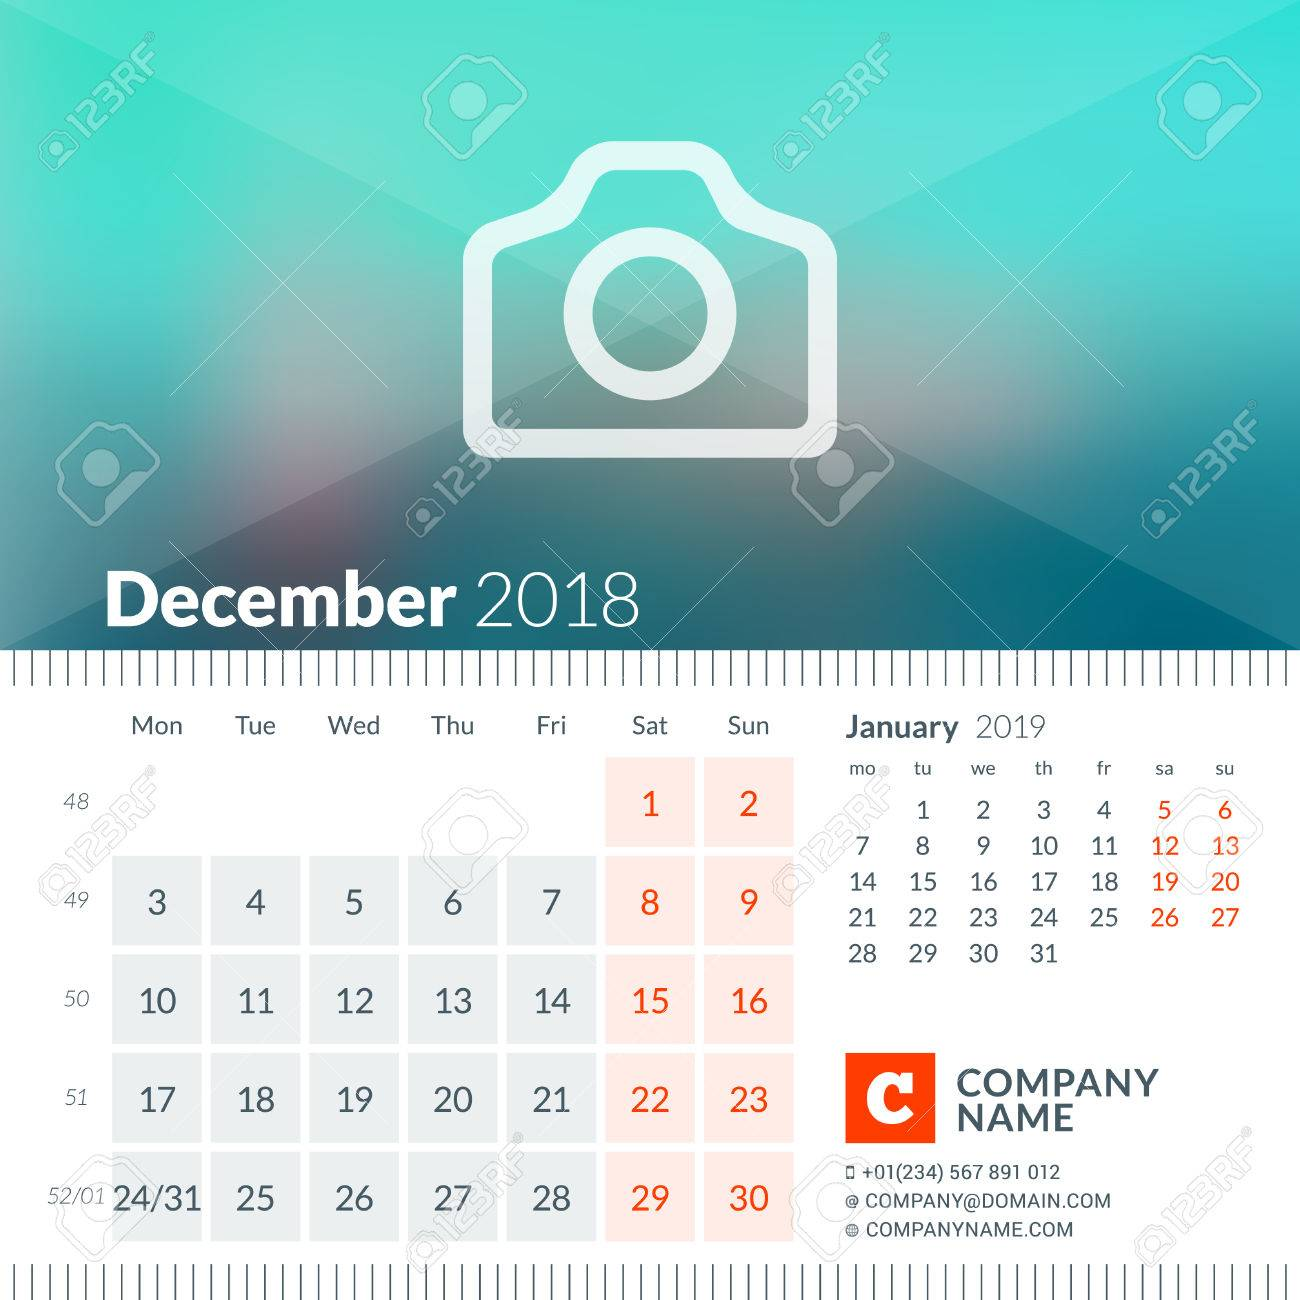 December 2018 Calendar For 2018 Year Week Starts On Monday